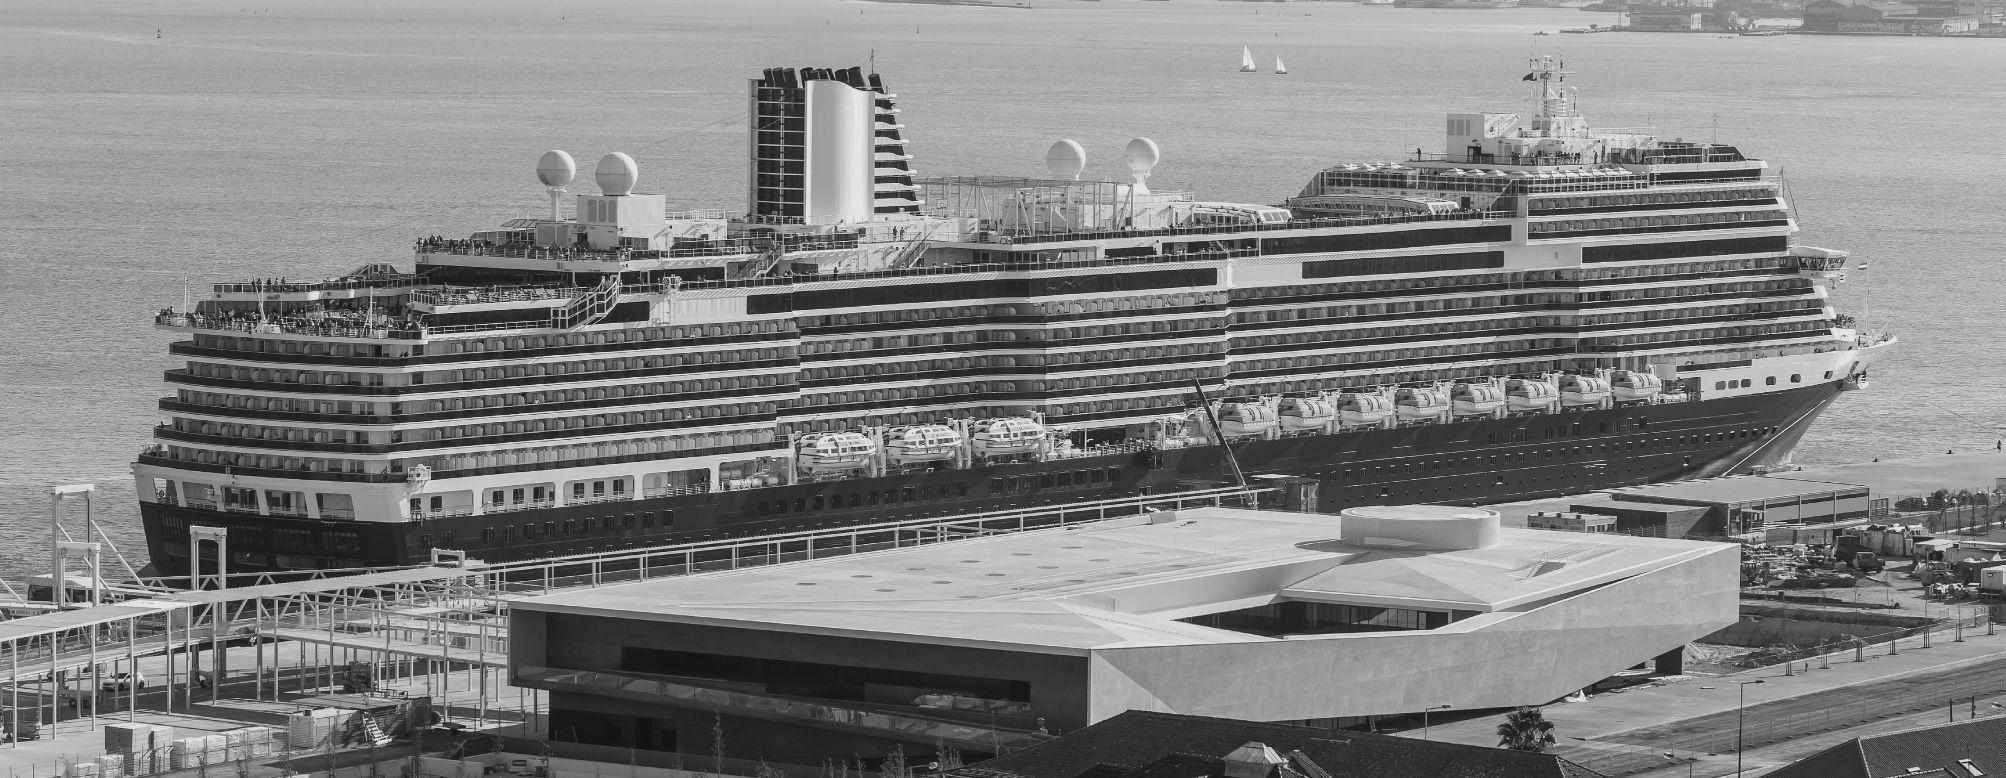 Navio de cruzeiro, Rio Tejo, Lisboa